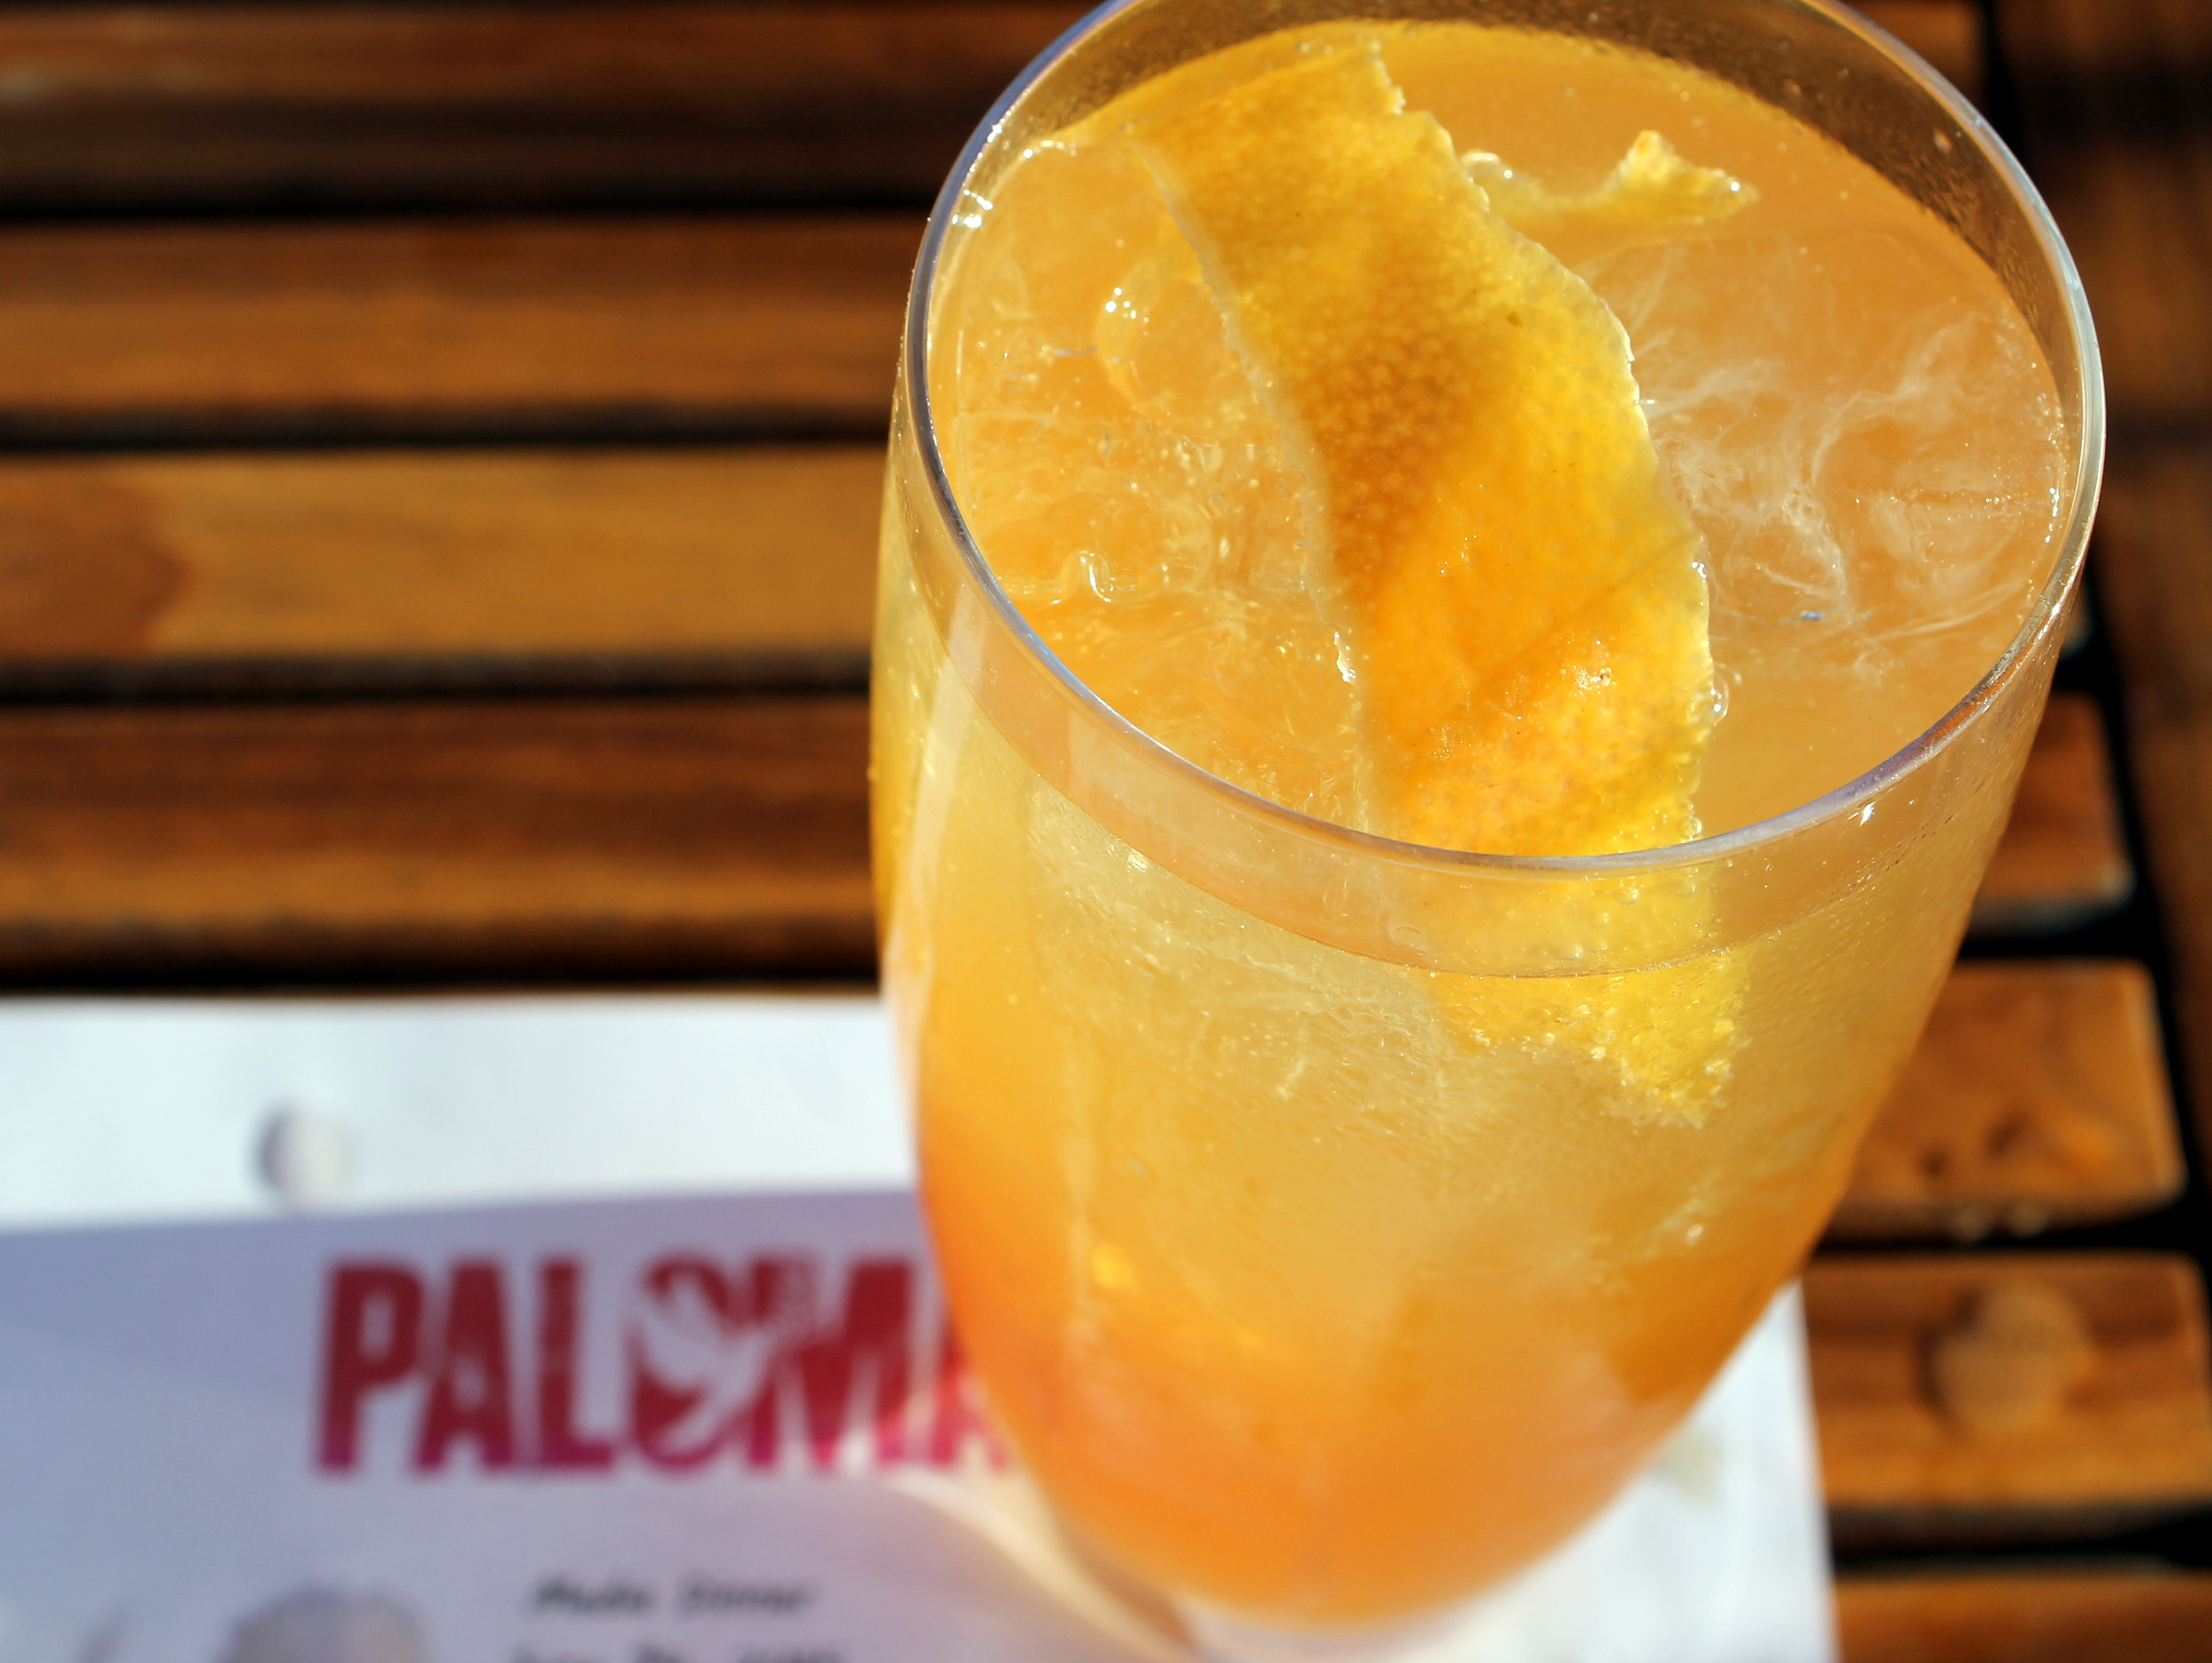 The Paloma Margarita. Paloma, Stamford CT. Image via Jessica Moseley Gordon